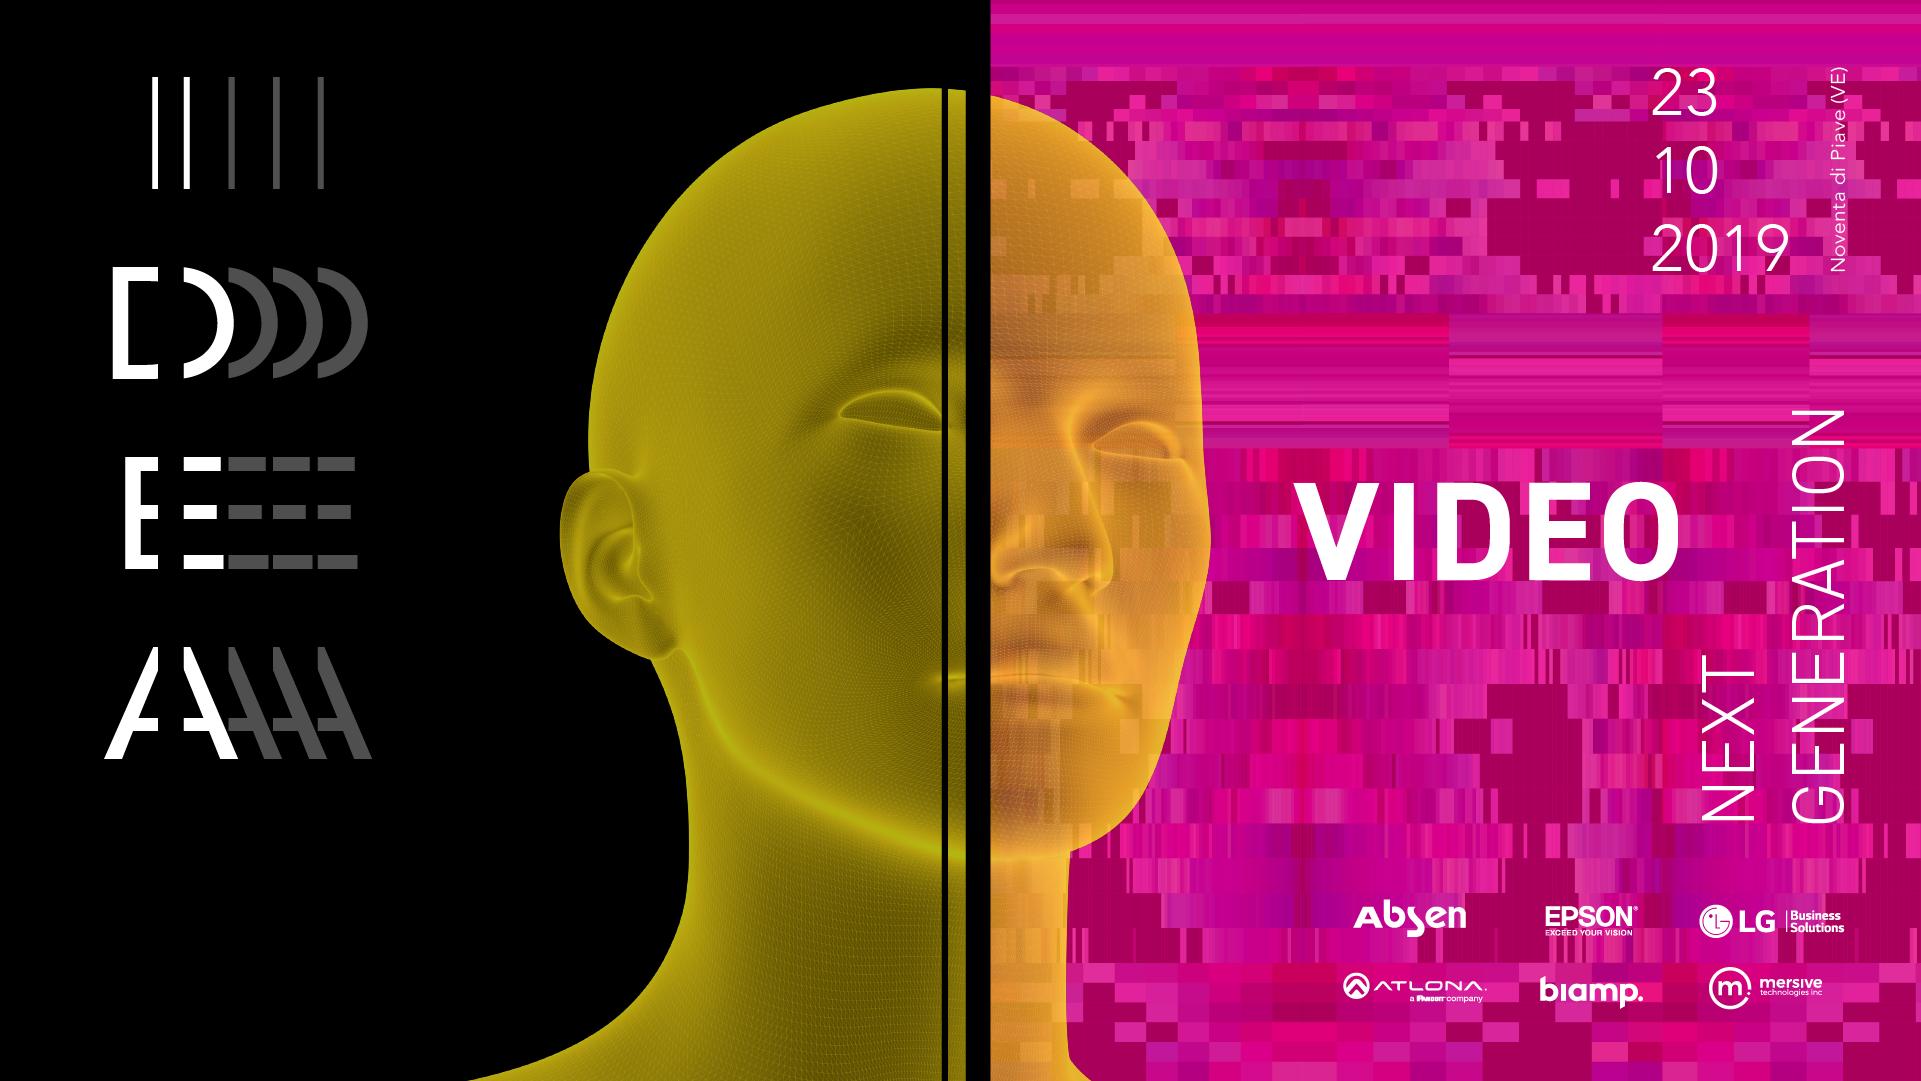 IDEA - Video Next Generation